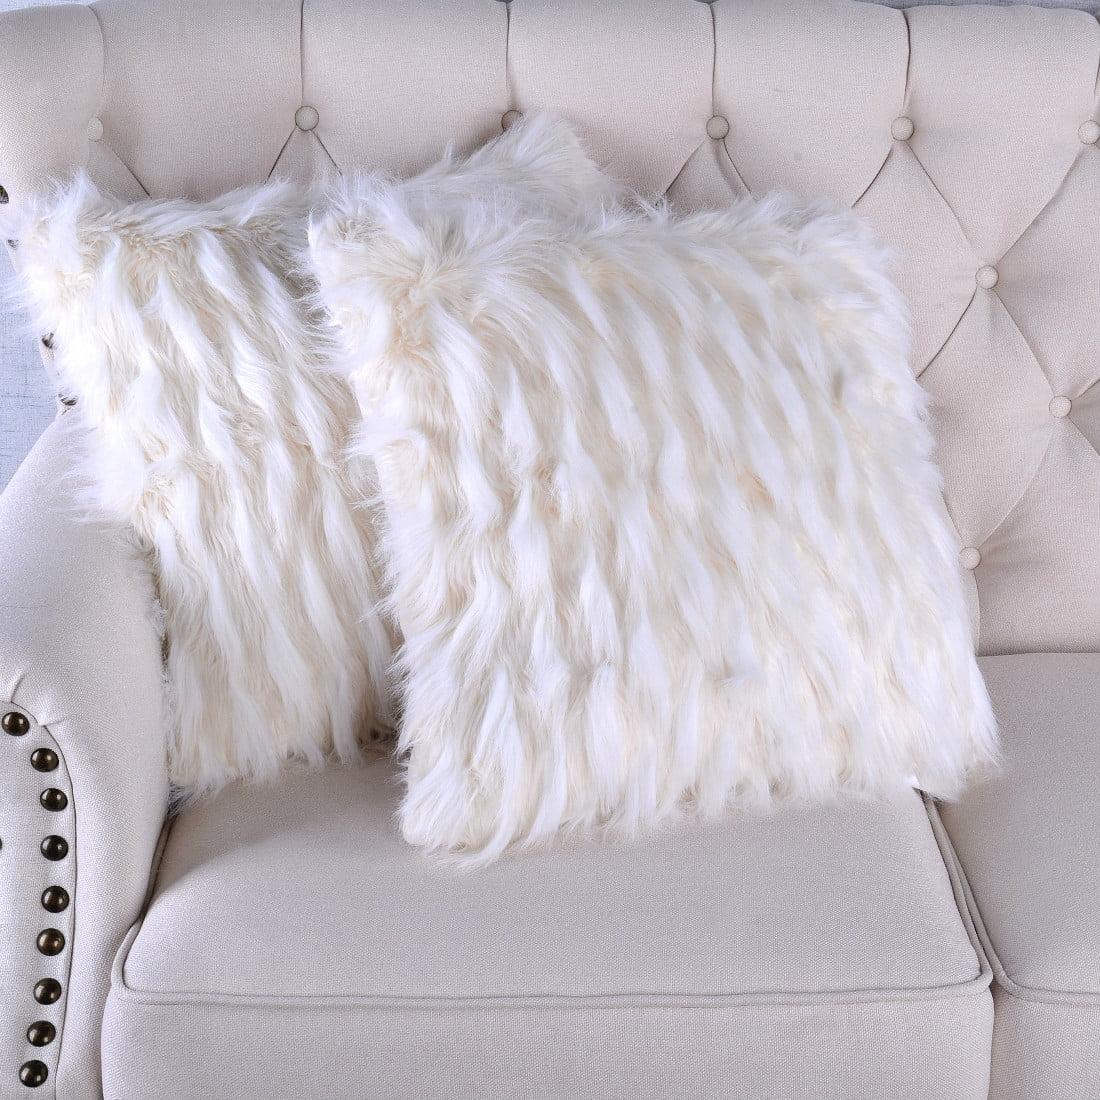 Serenta Feathery Faux Fur 2 Piece Pillow Shell Set